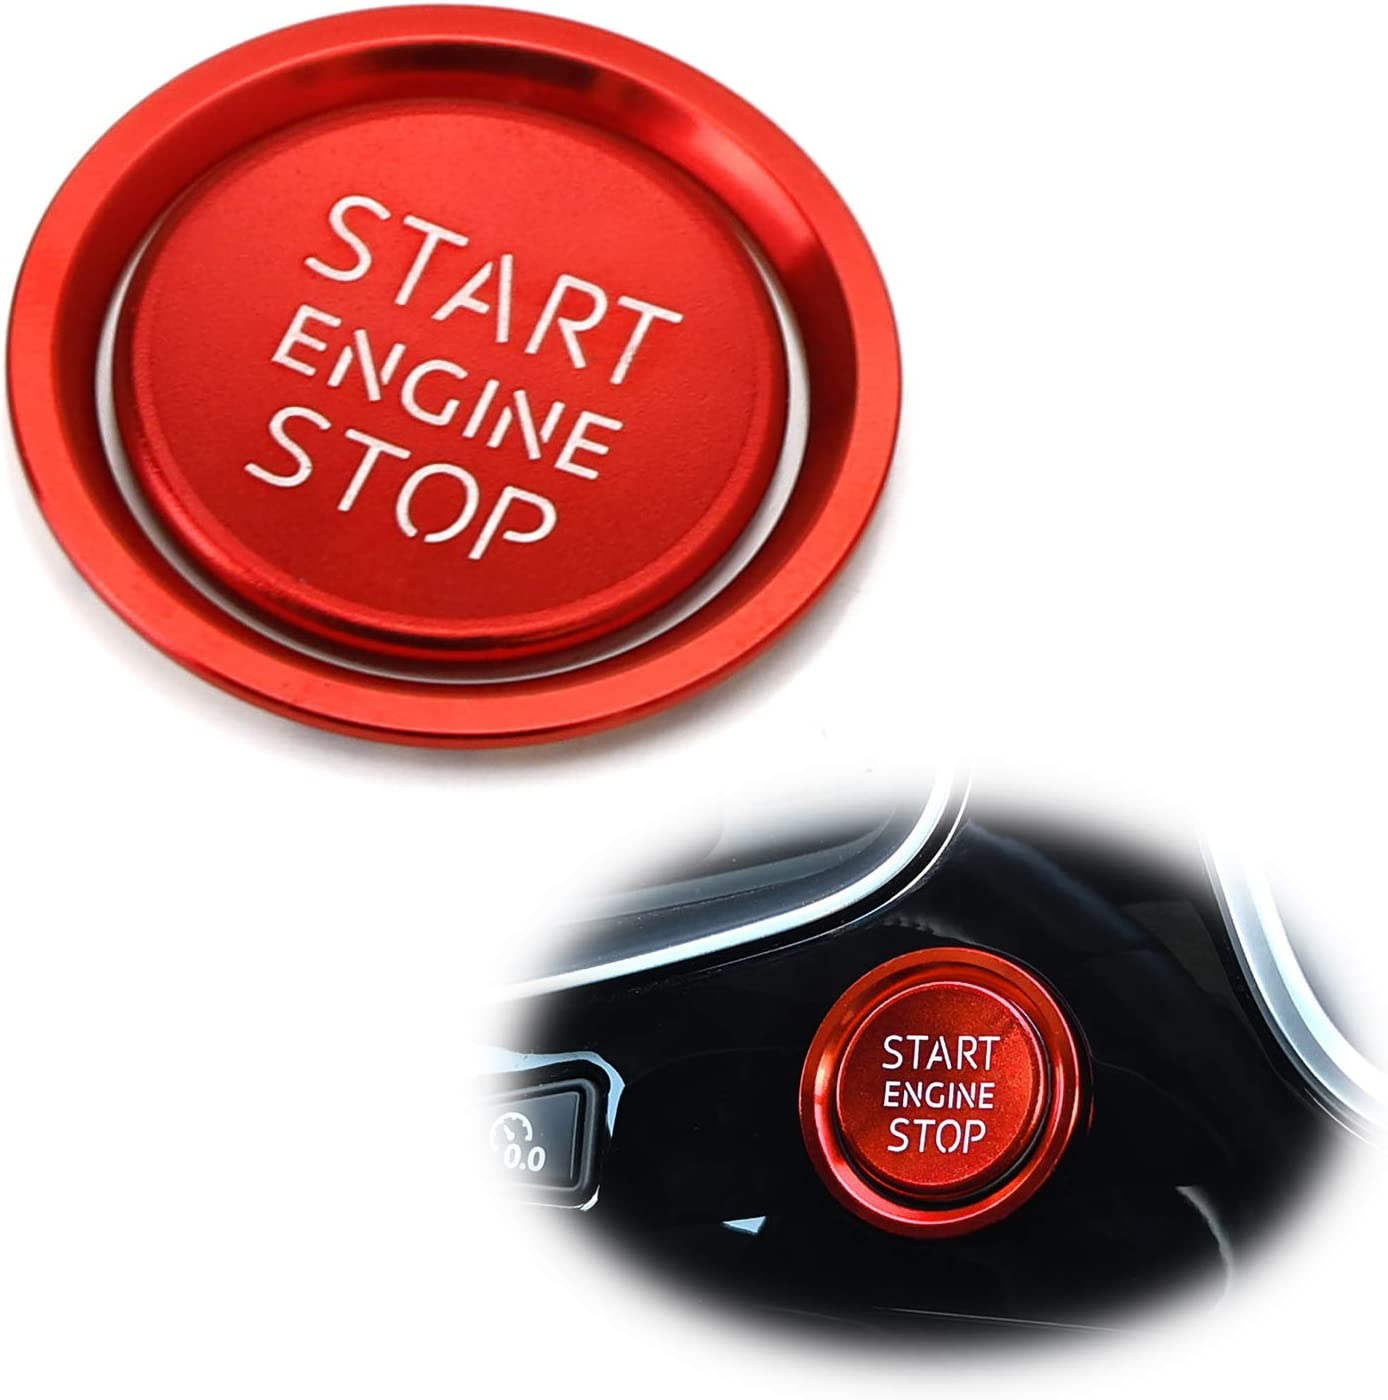 Start Engine Button Decor Ring Trim Aluminum Alloy Fit For Audi A4 A5 A6 Q5 A7